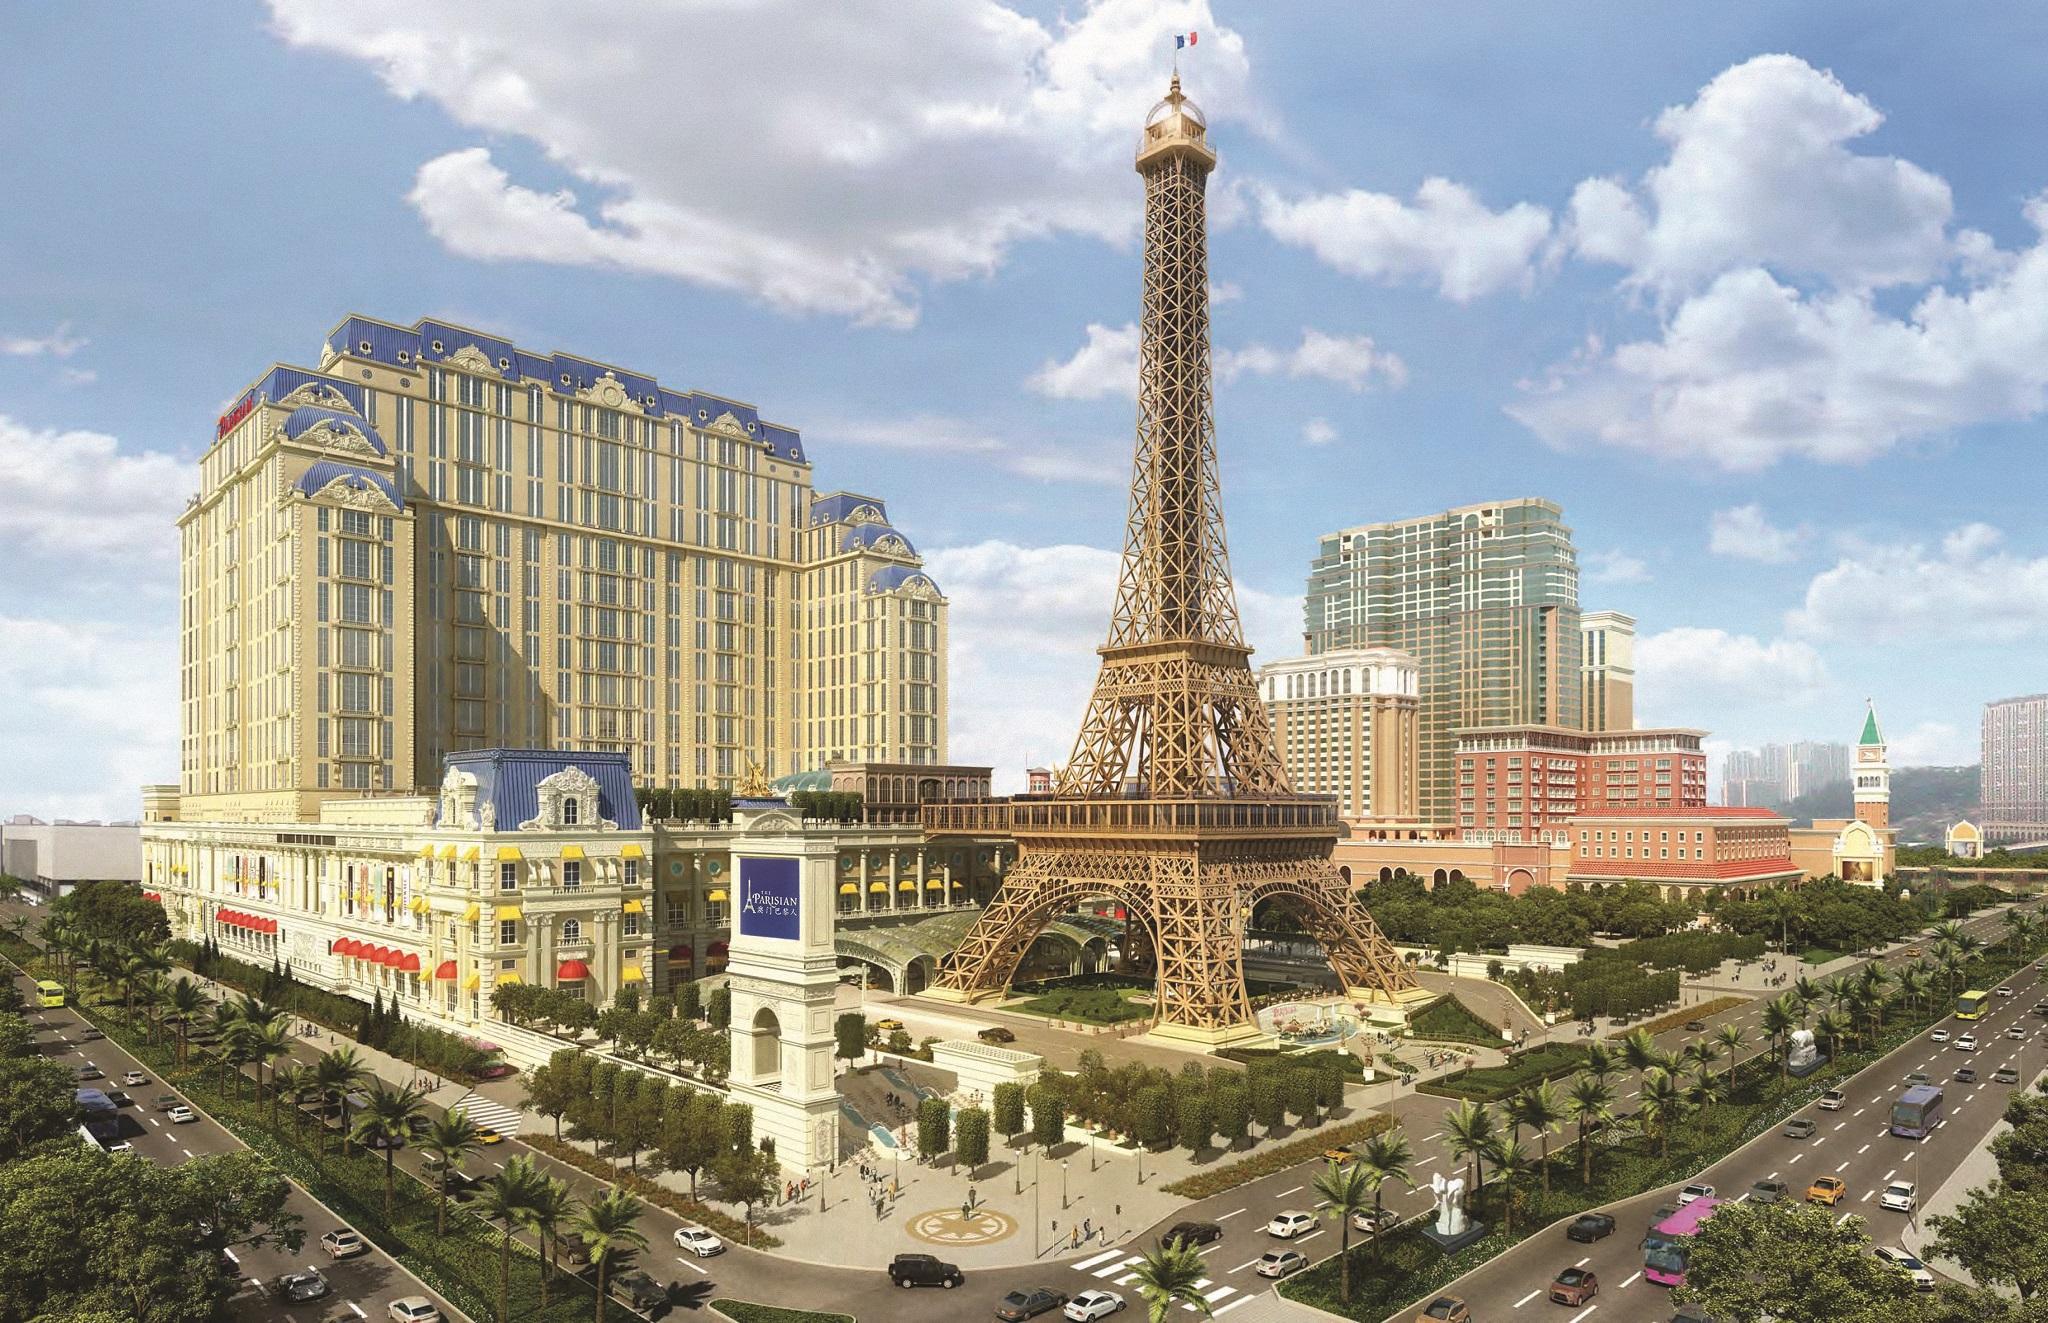 The Parisian Macao, Cotai